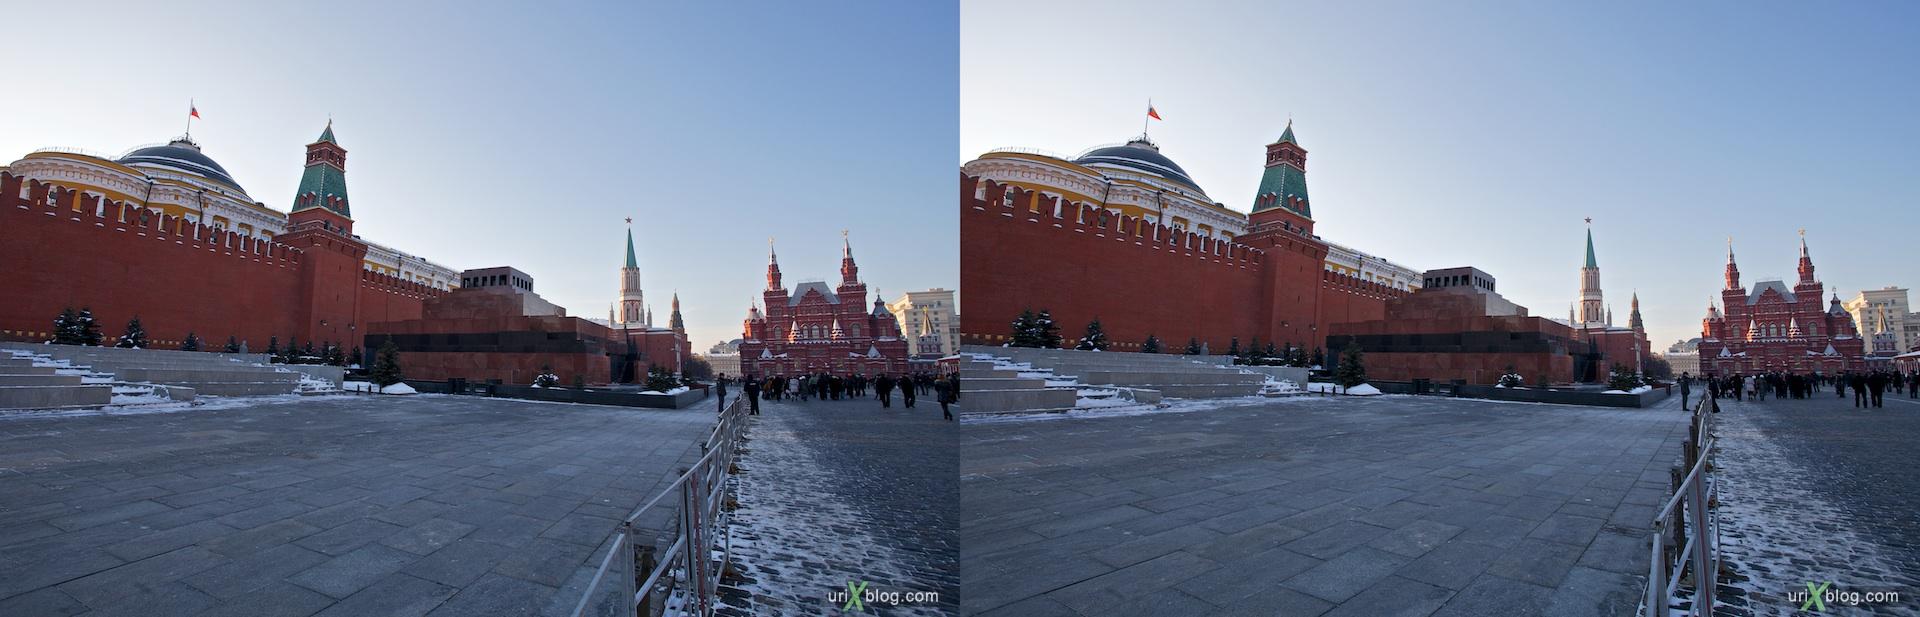 2010 3D, stereo, cross-eyed, стерео, стереопара Moscow, Москва, Красная площадь, Reg square